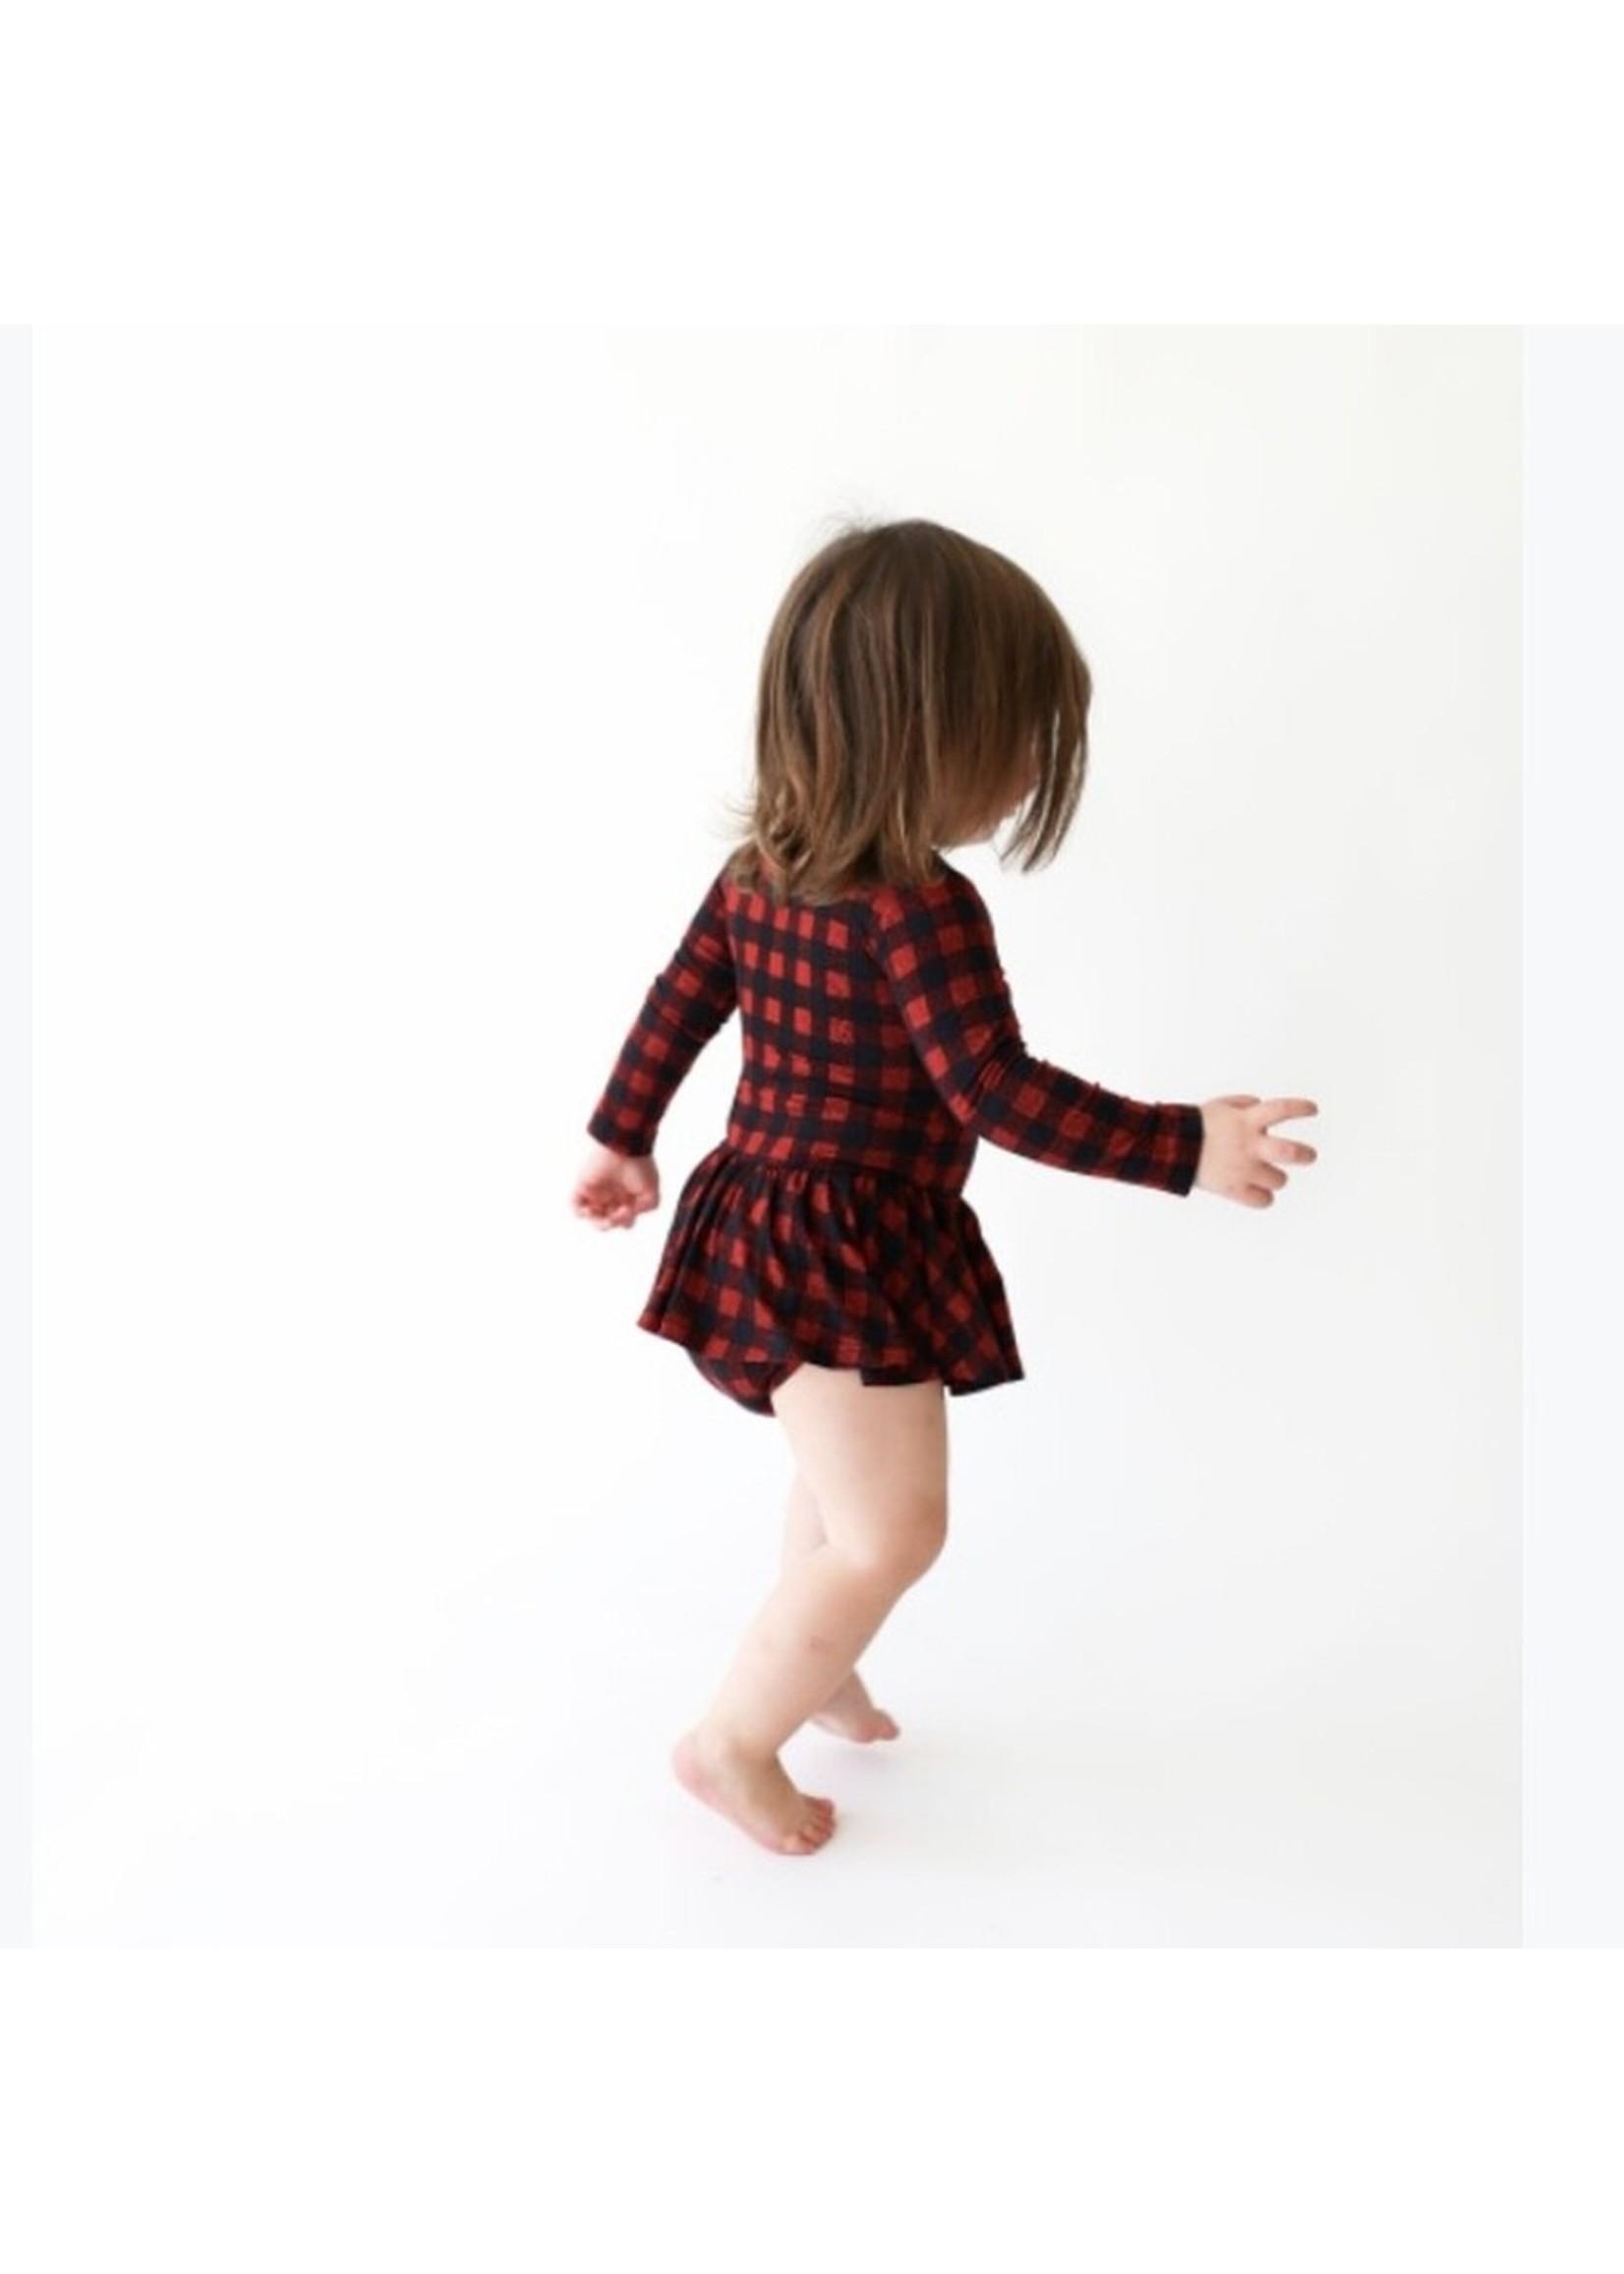 posh peanut Grayson Long Sleeve Twirl Skirt Bodysuit 12-18 mos.